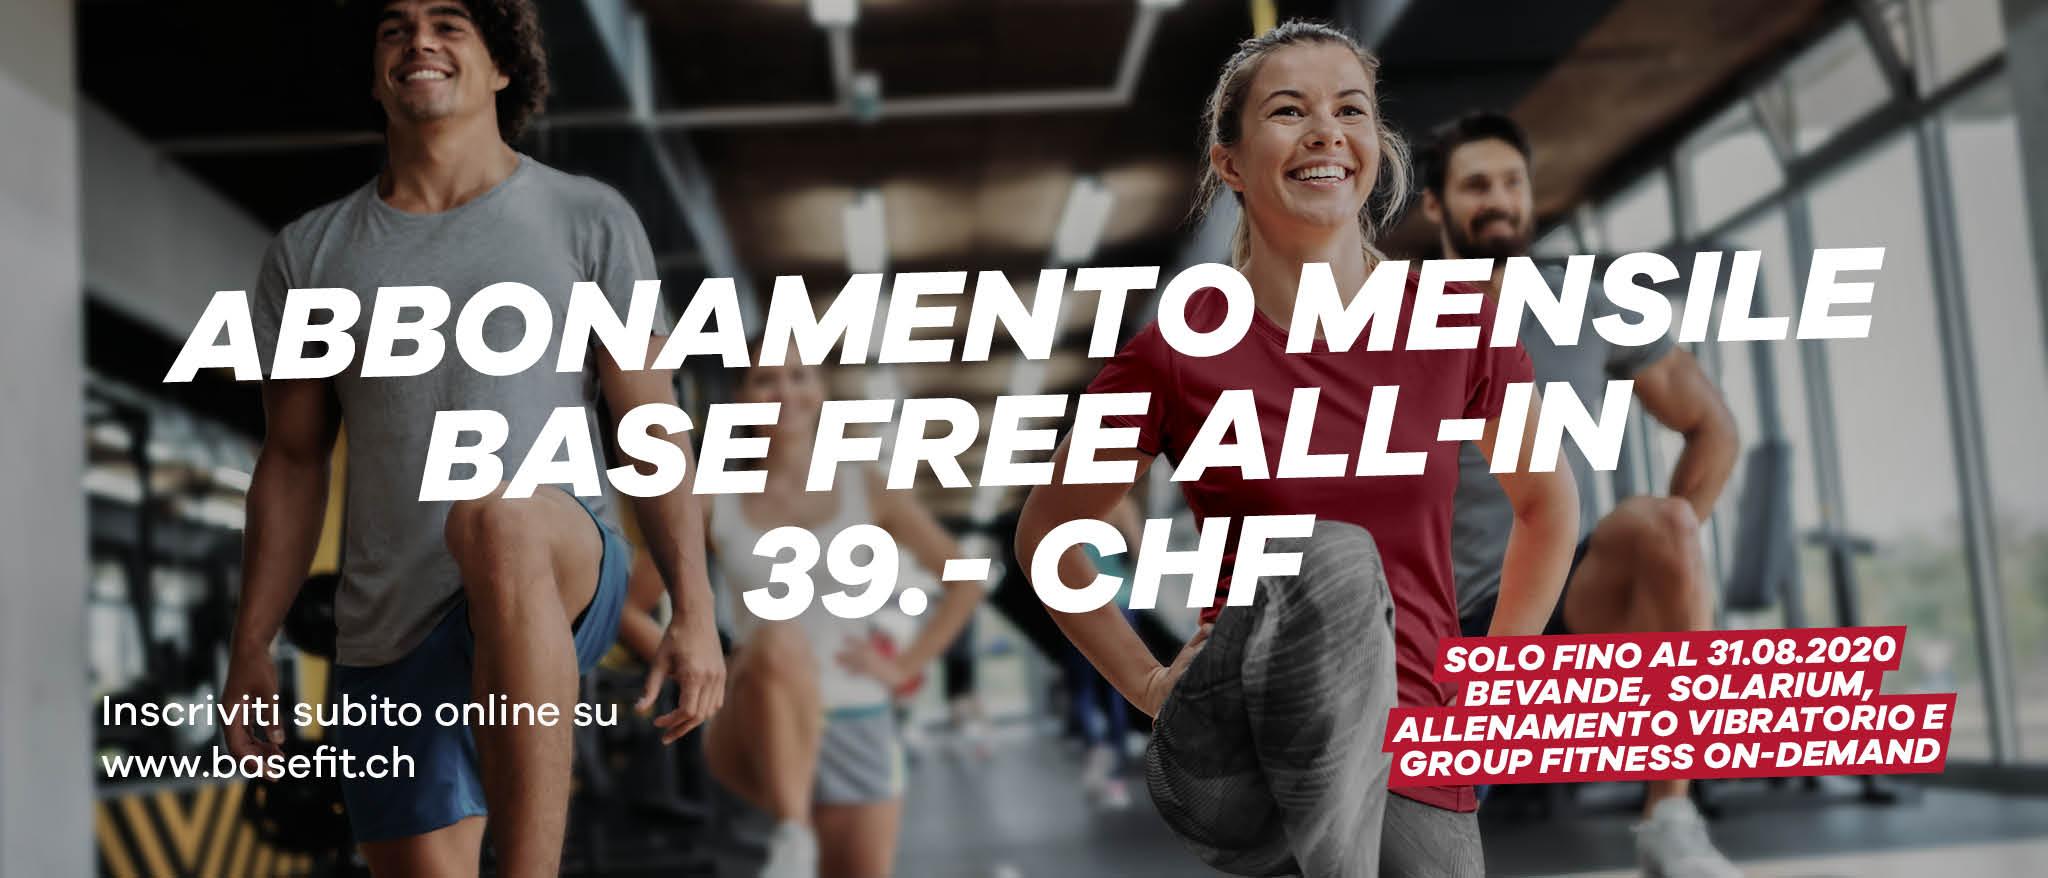 Base Free CHF 39